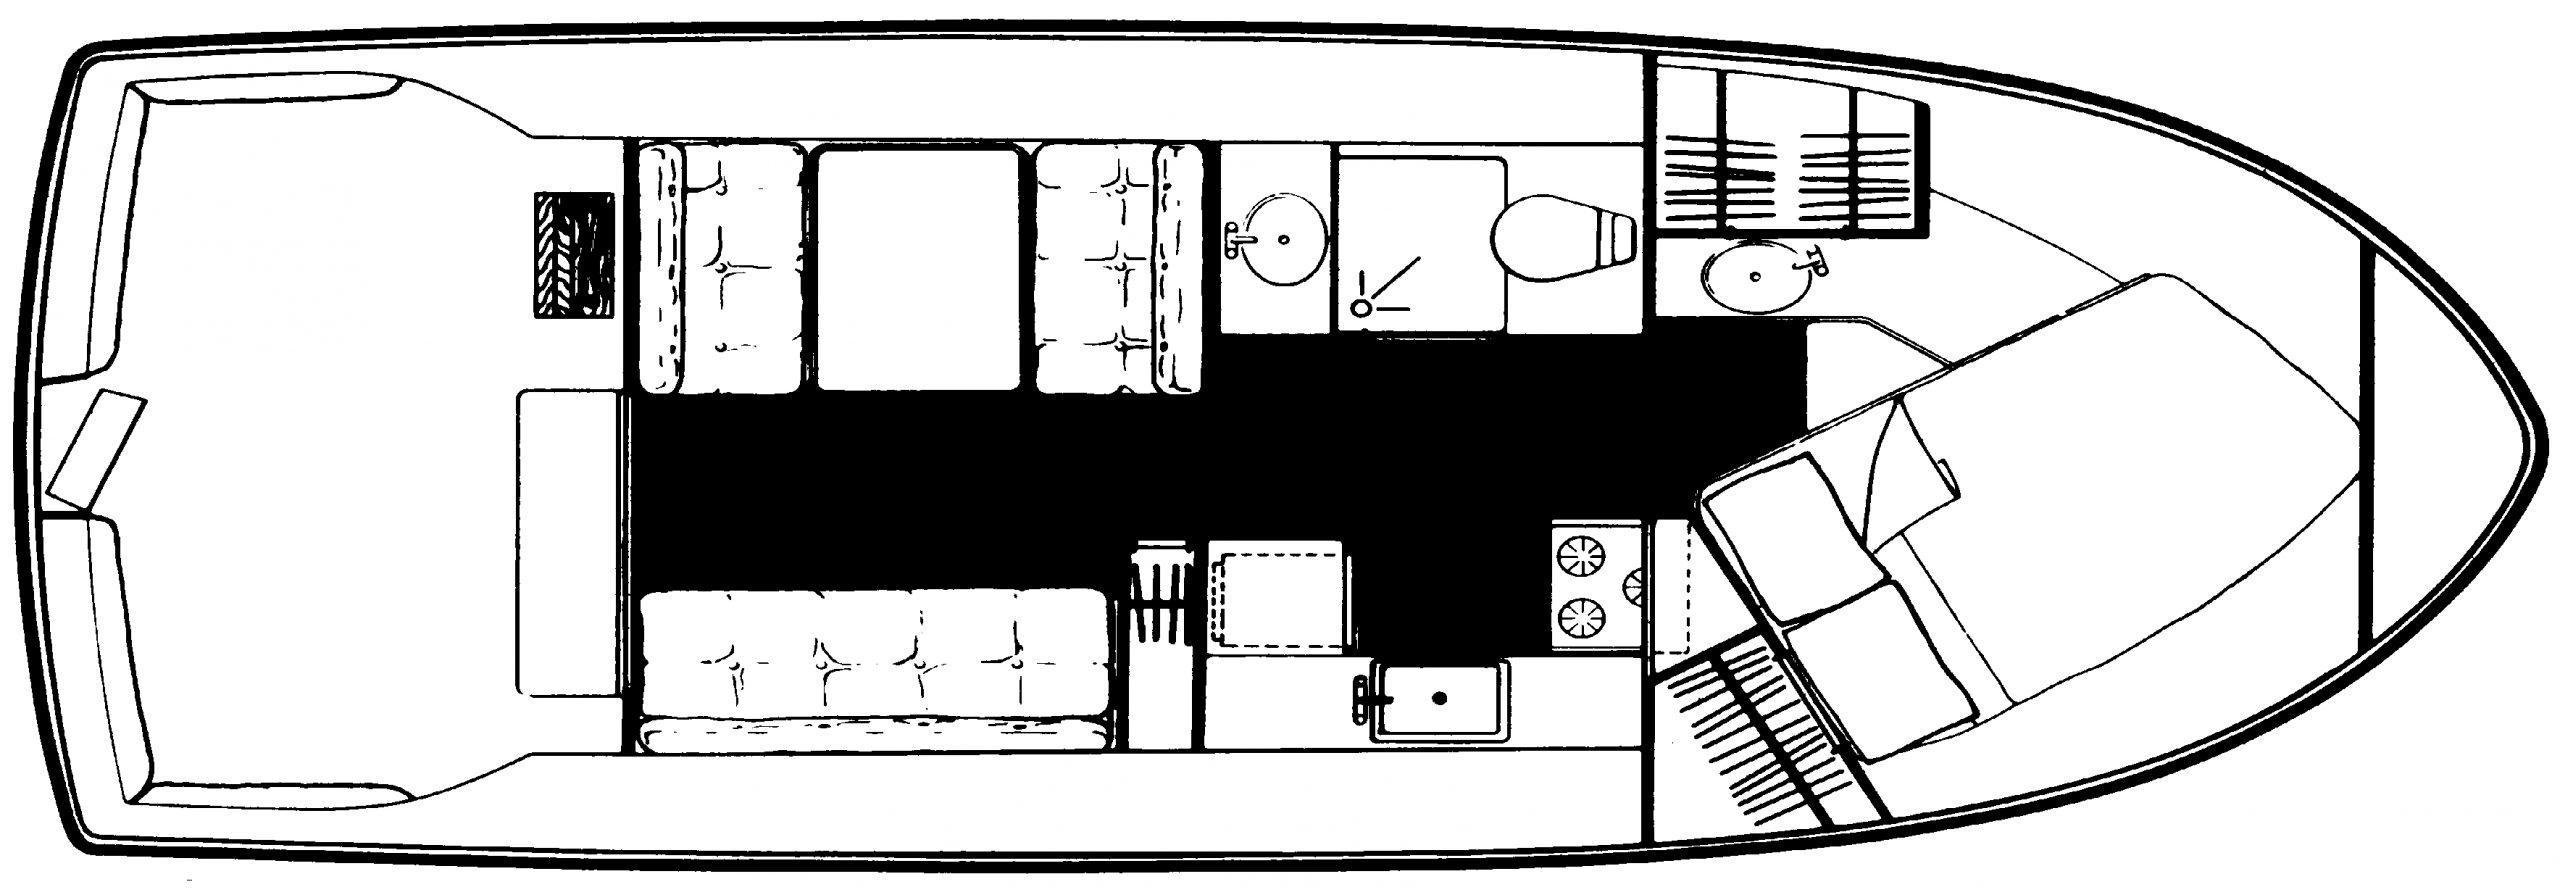 2827 Voyager; 2897 Mariner Floor Plan 2